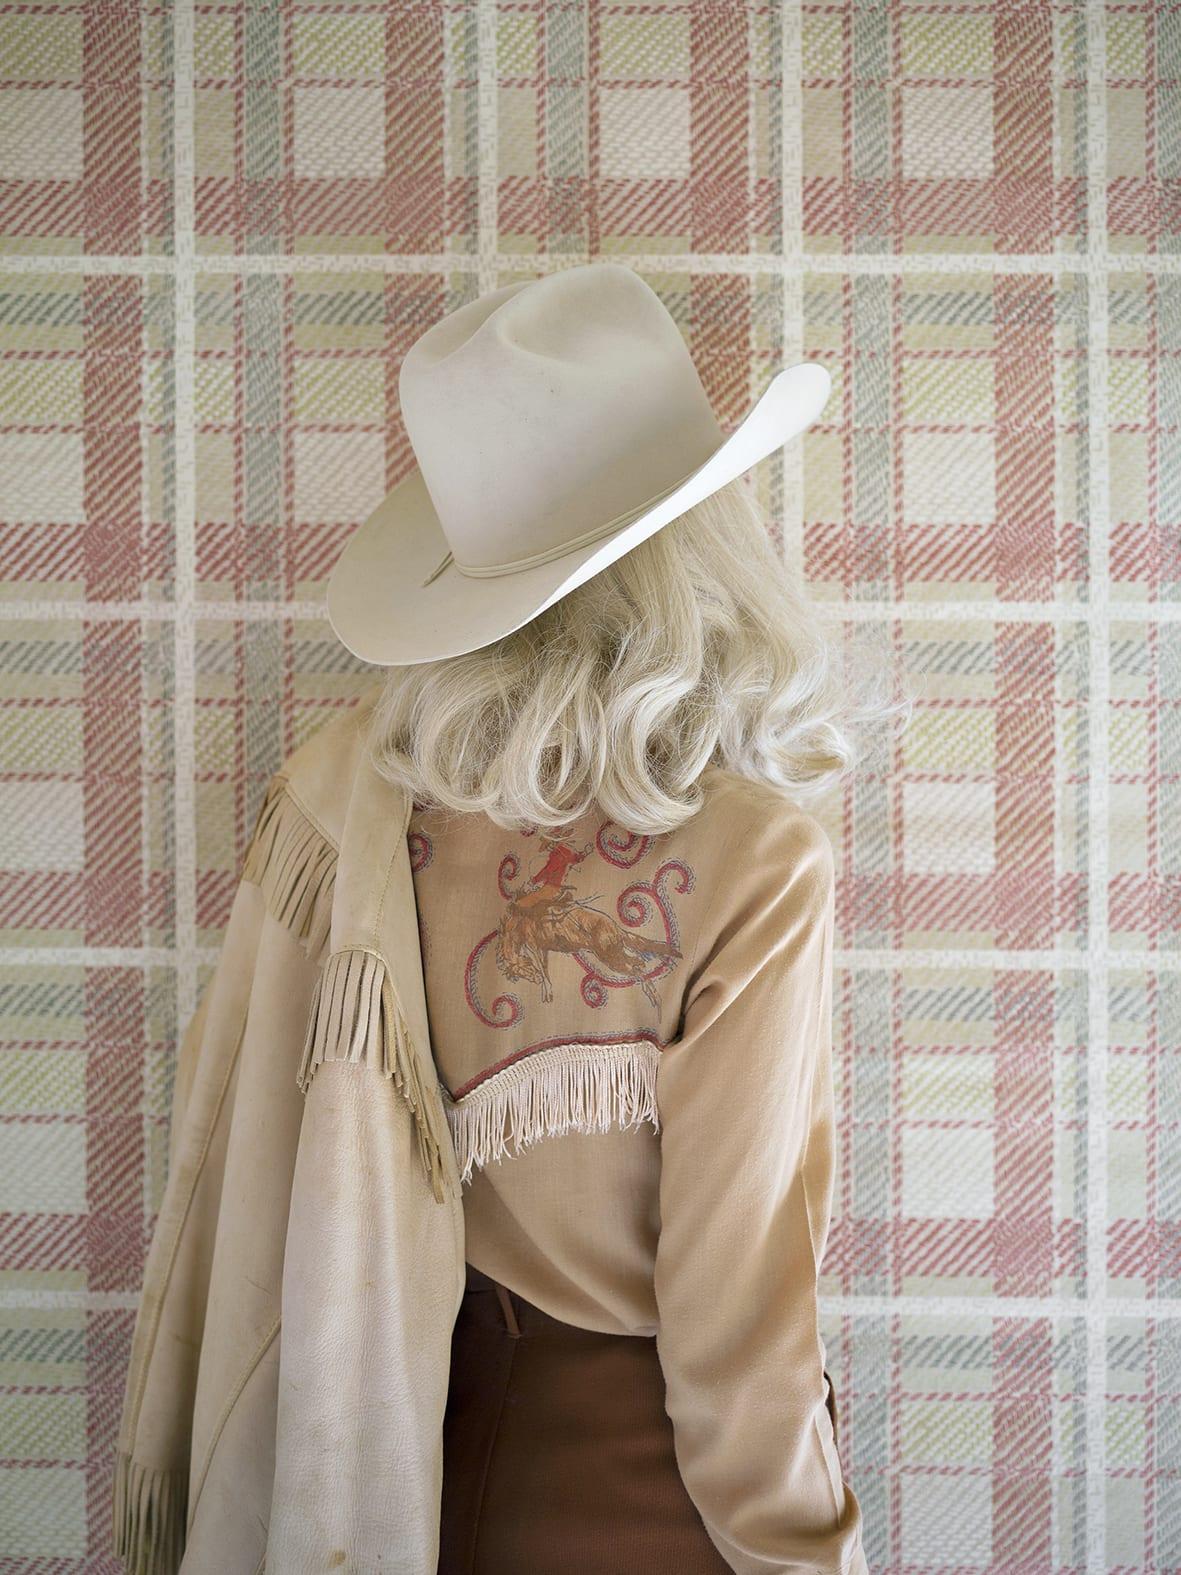 Anja Niemi, The Cowboy, 2018